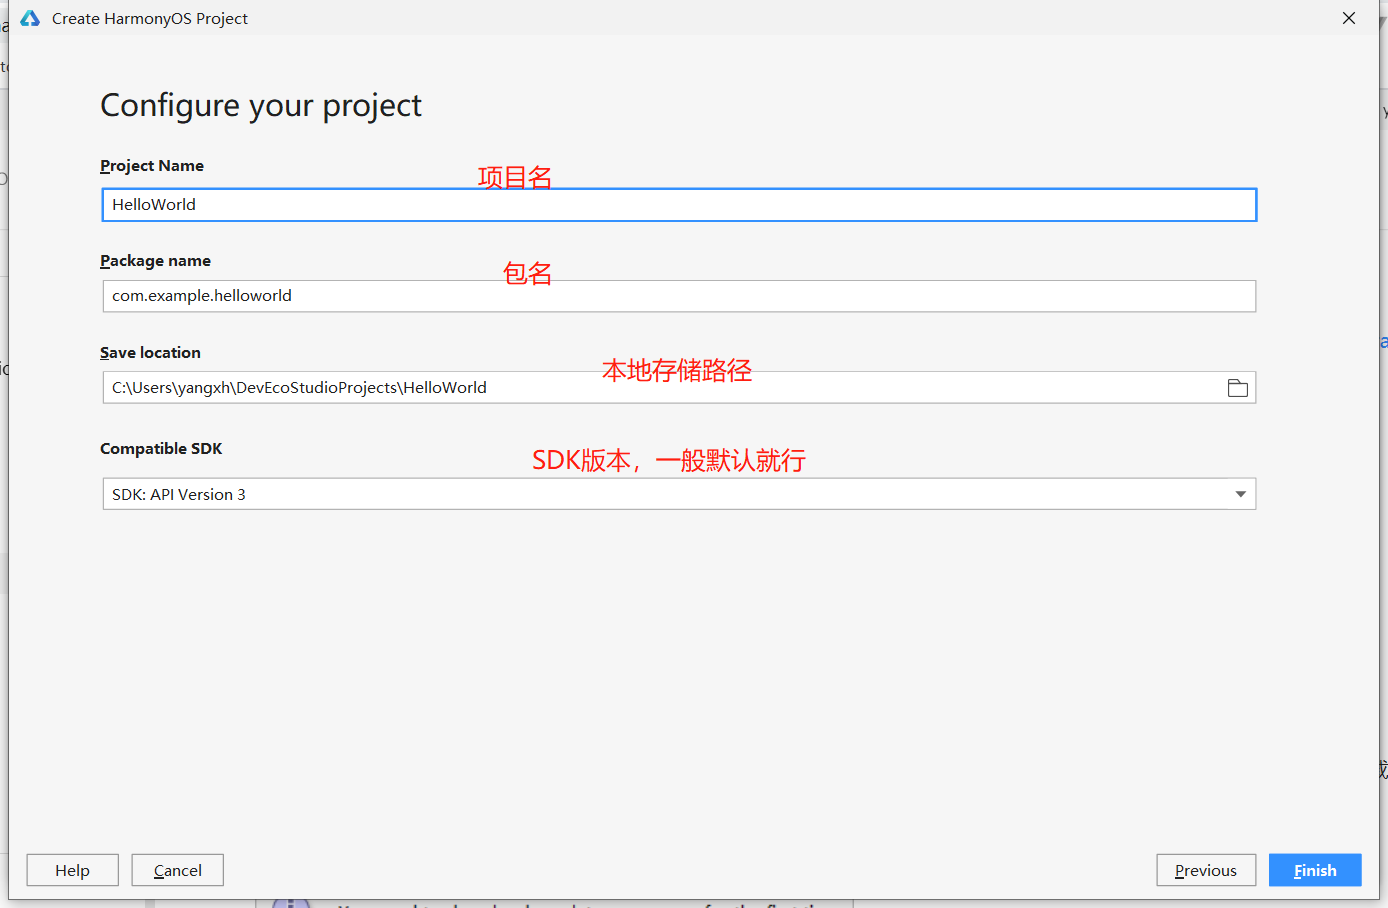 38d49854a2e7ed6380557ec5d13d61a9 - HarmonyOS(五)应用开发之创建第一个HelloWorld应用